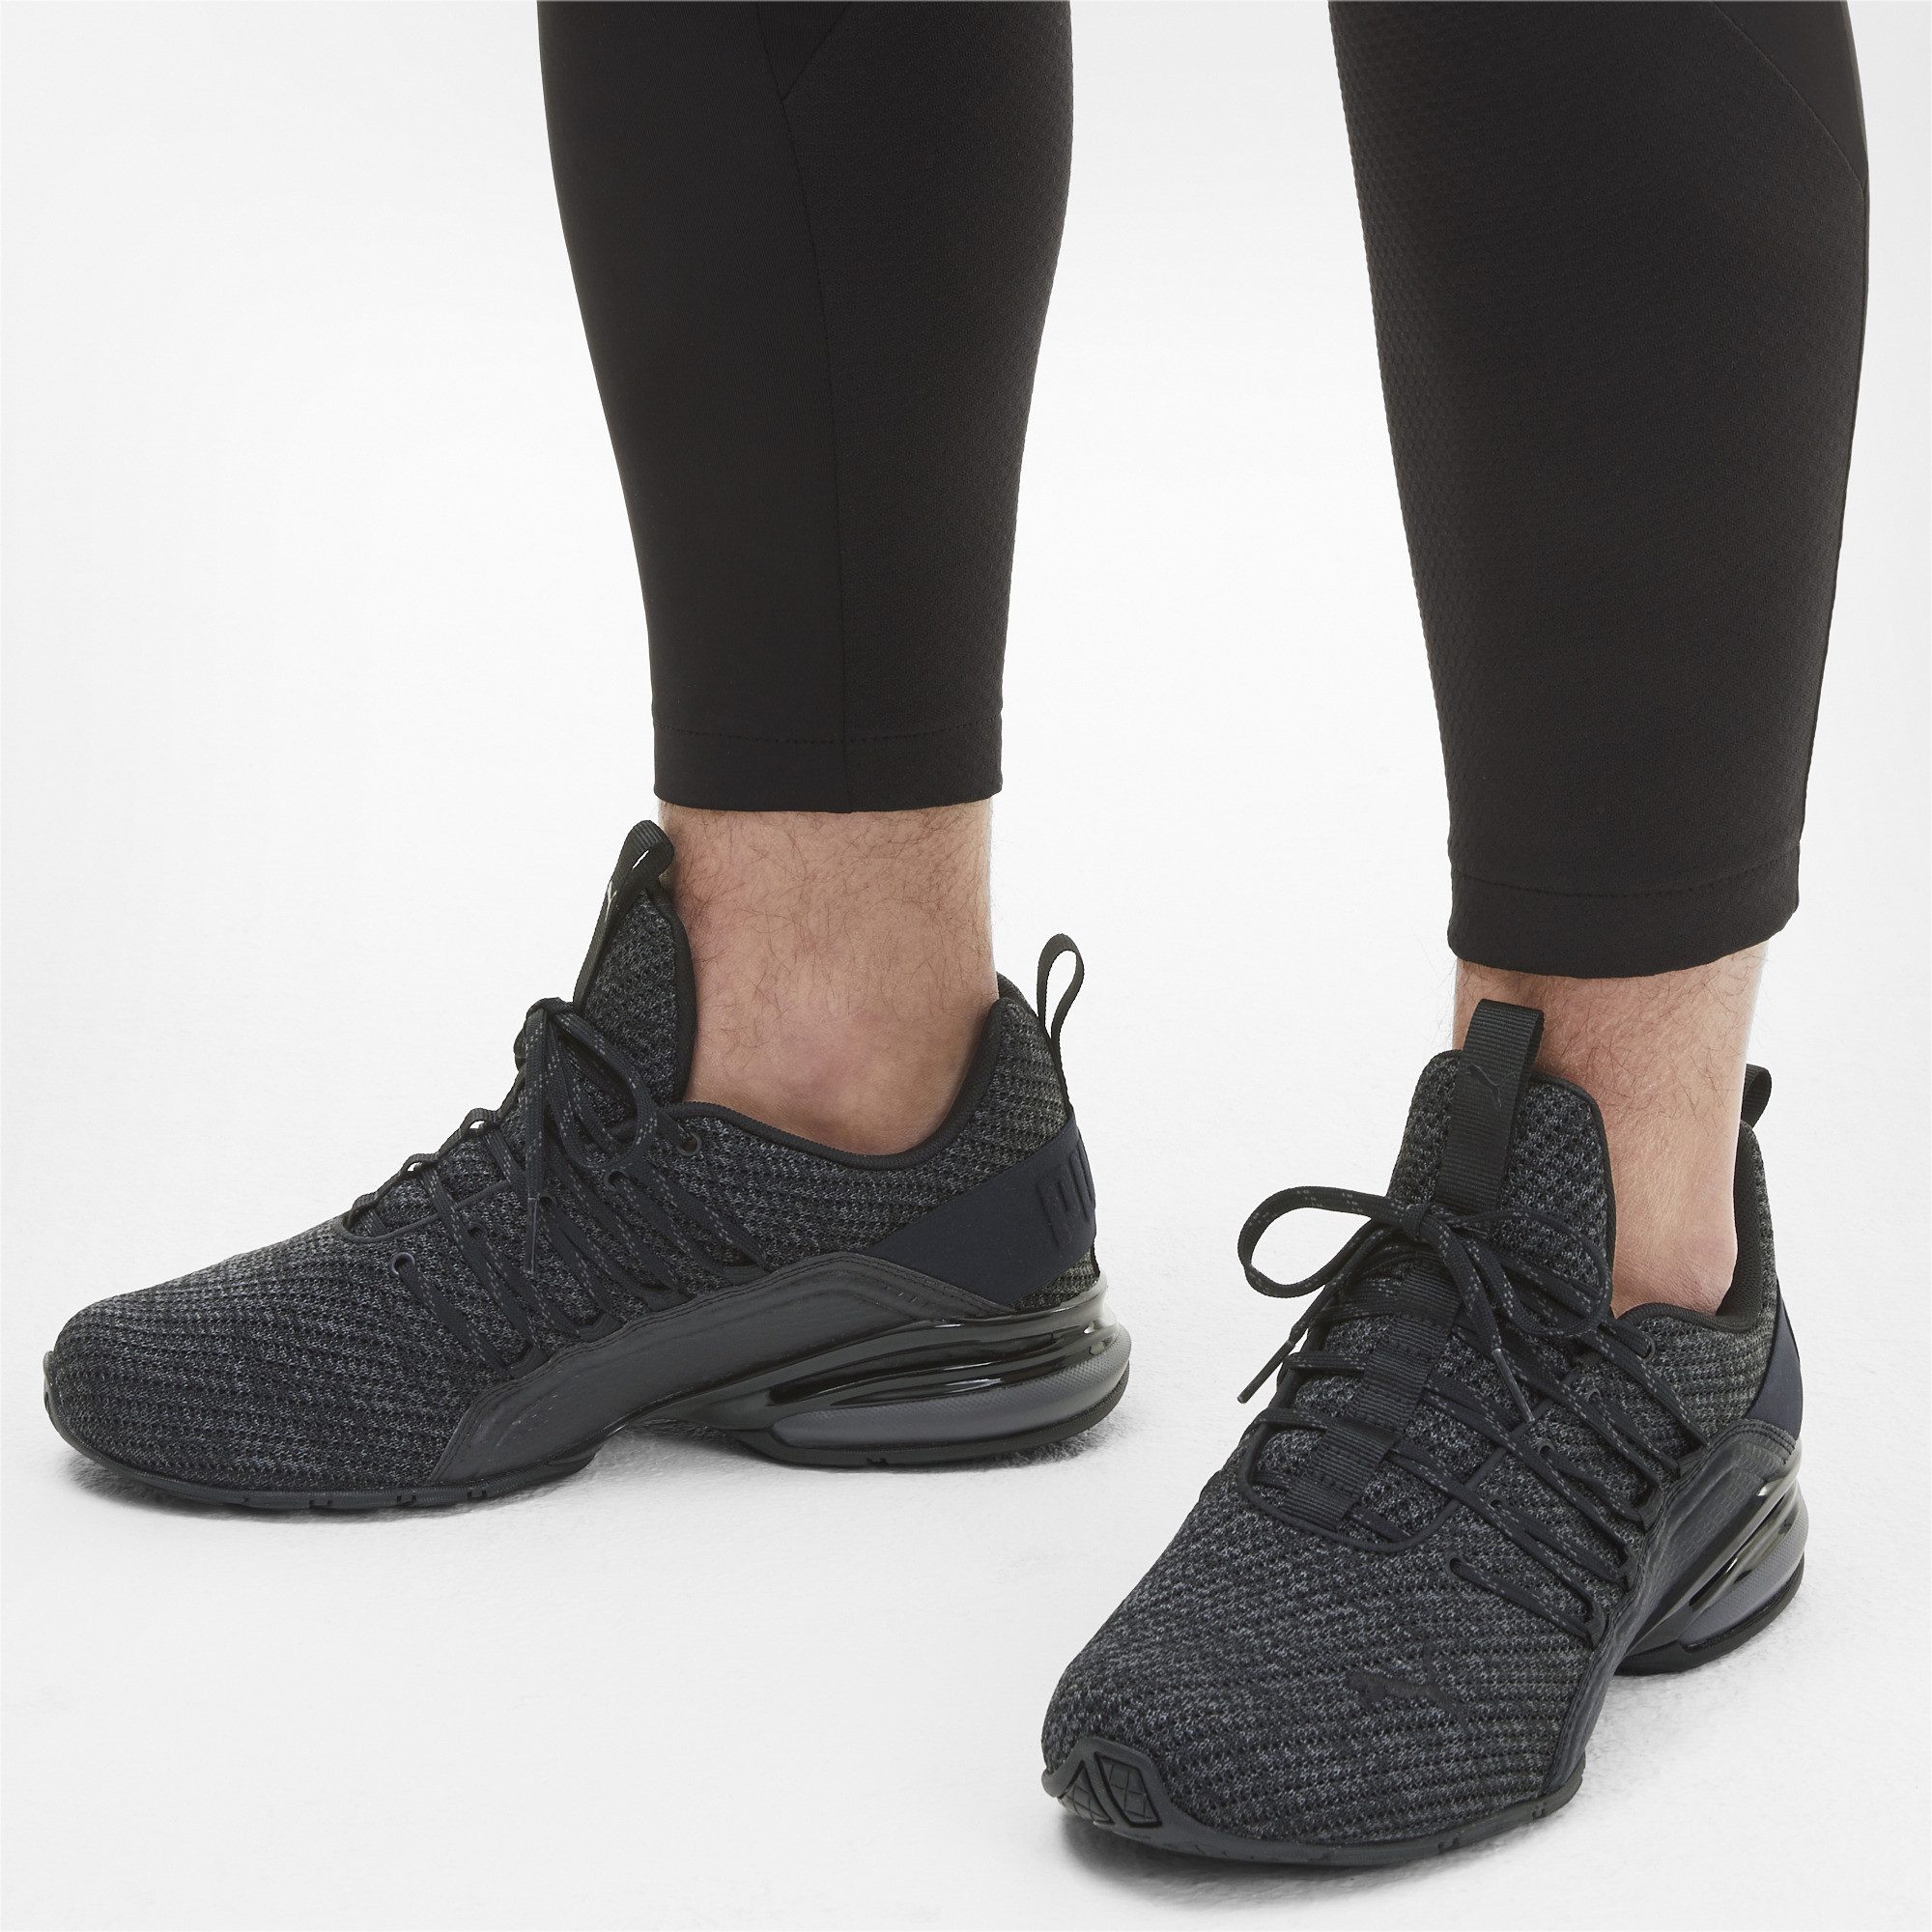 PUMA-Men-039-s-Axelion-Ultra-Running-Shoes thumbnail 24